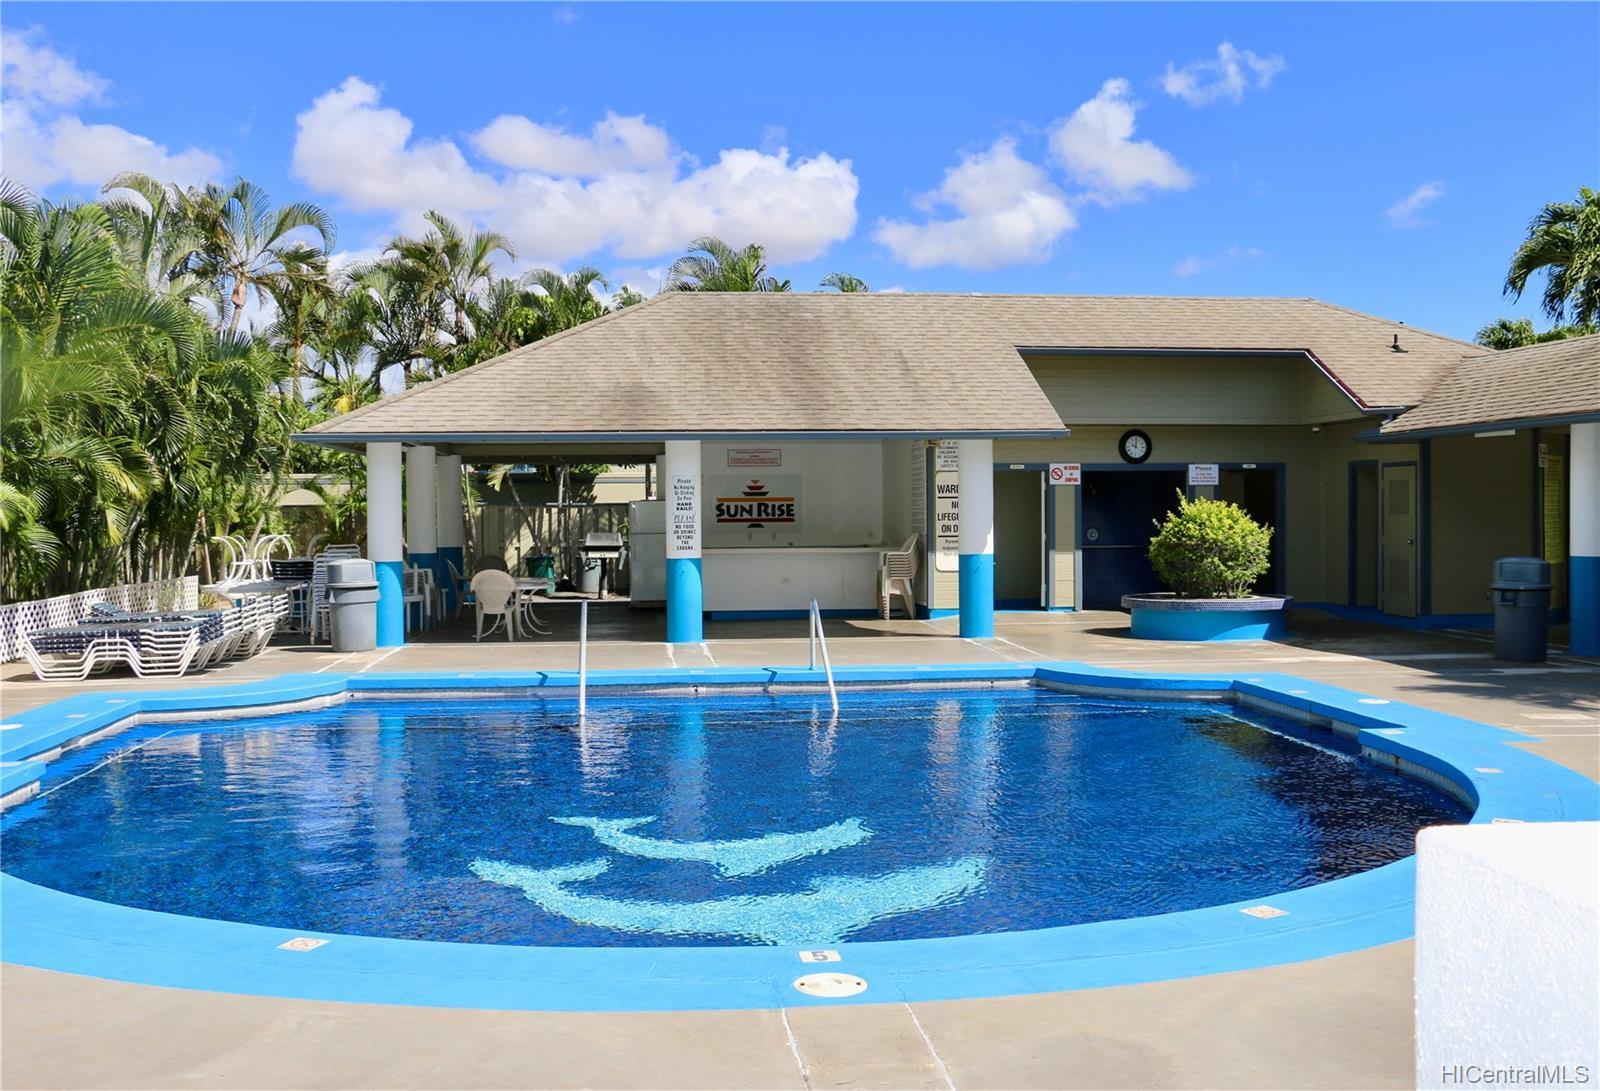 91-249 Hanapouli Circle townhouse # 20H, Ewa Beach, Hawaii - photo 2 of 11